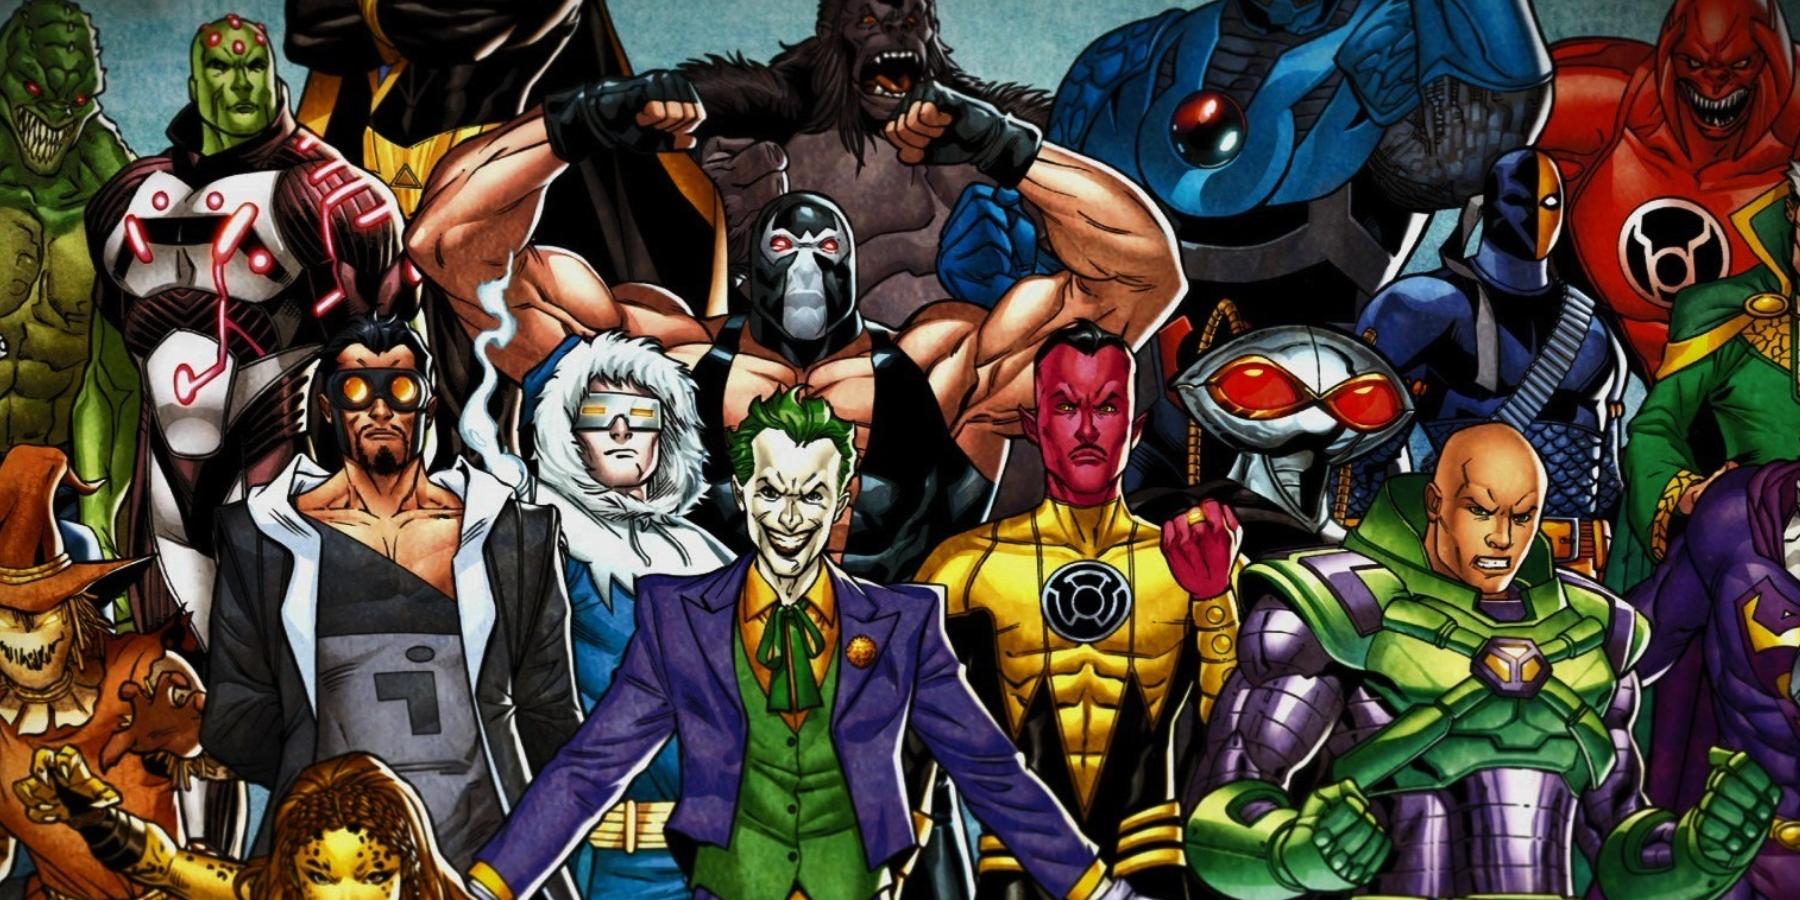 Who is DC's Deadliest Non-Powered Villain? | Screen Rant